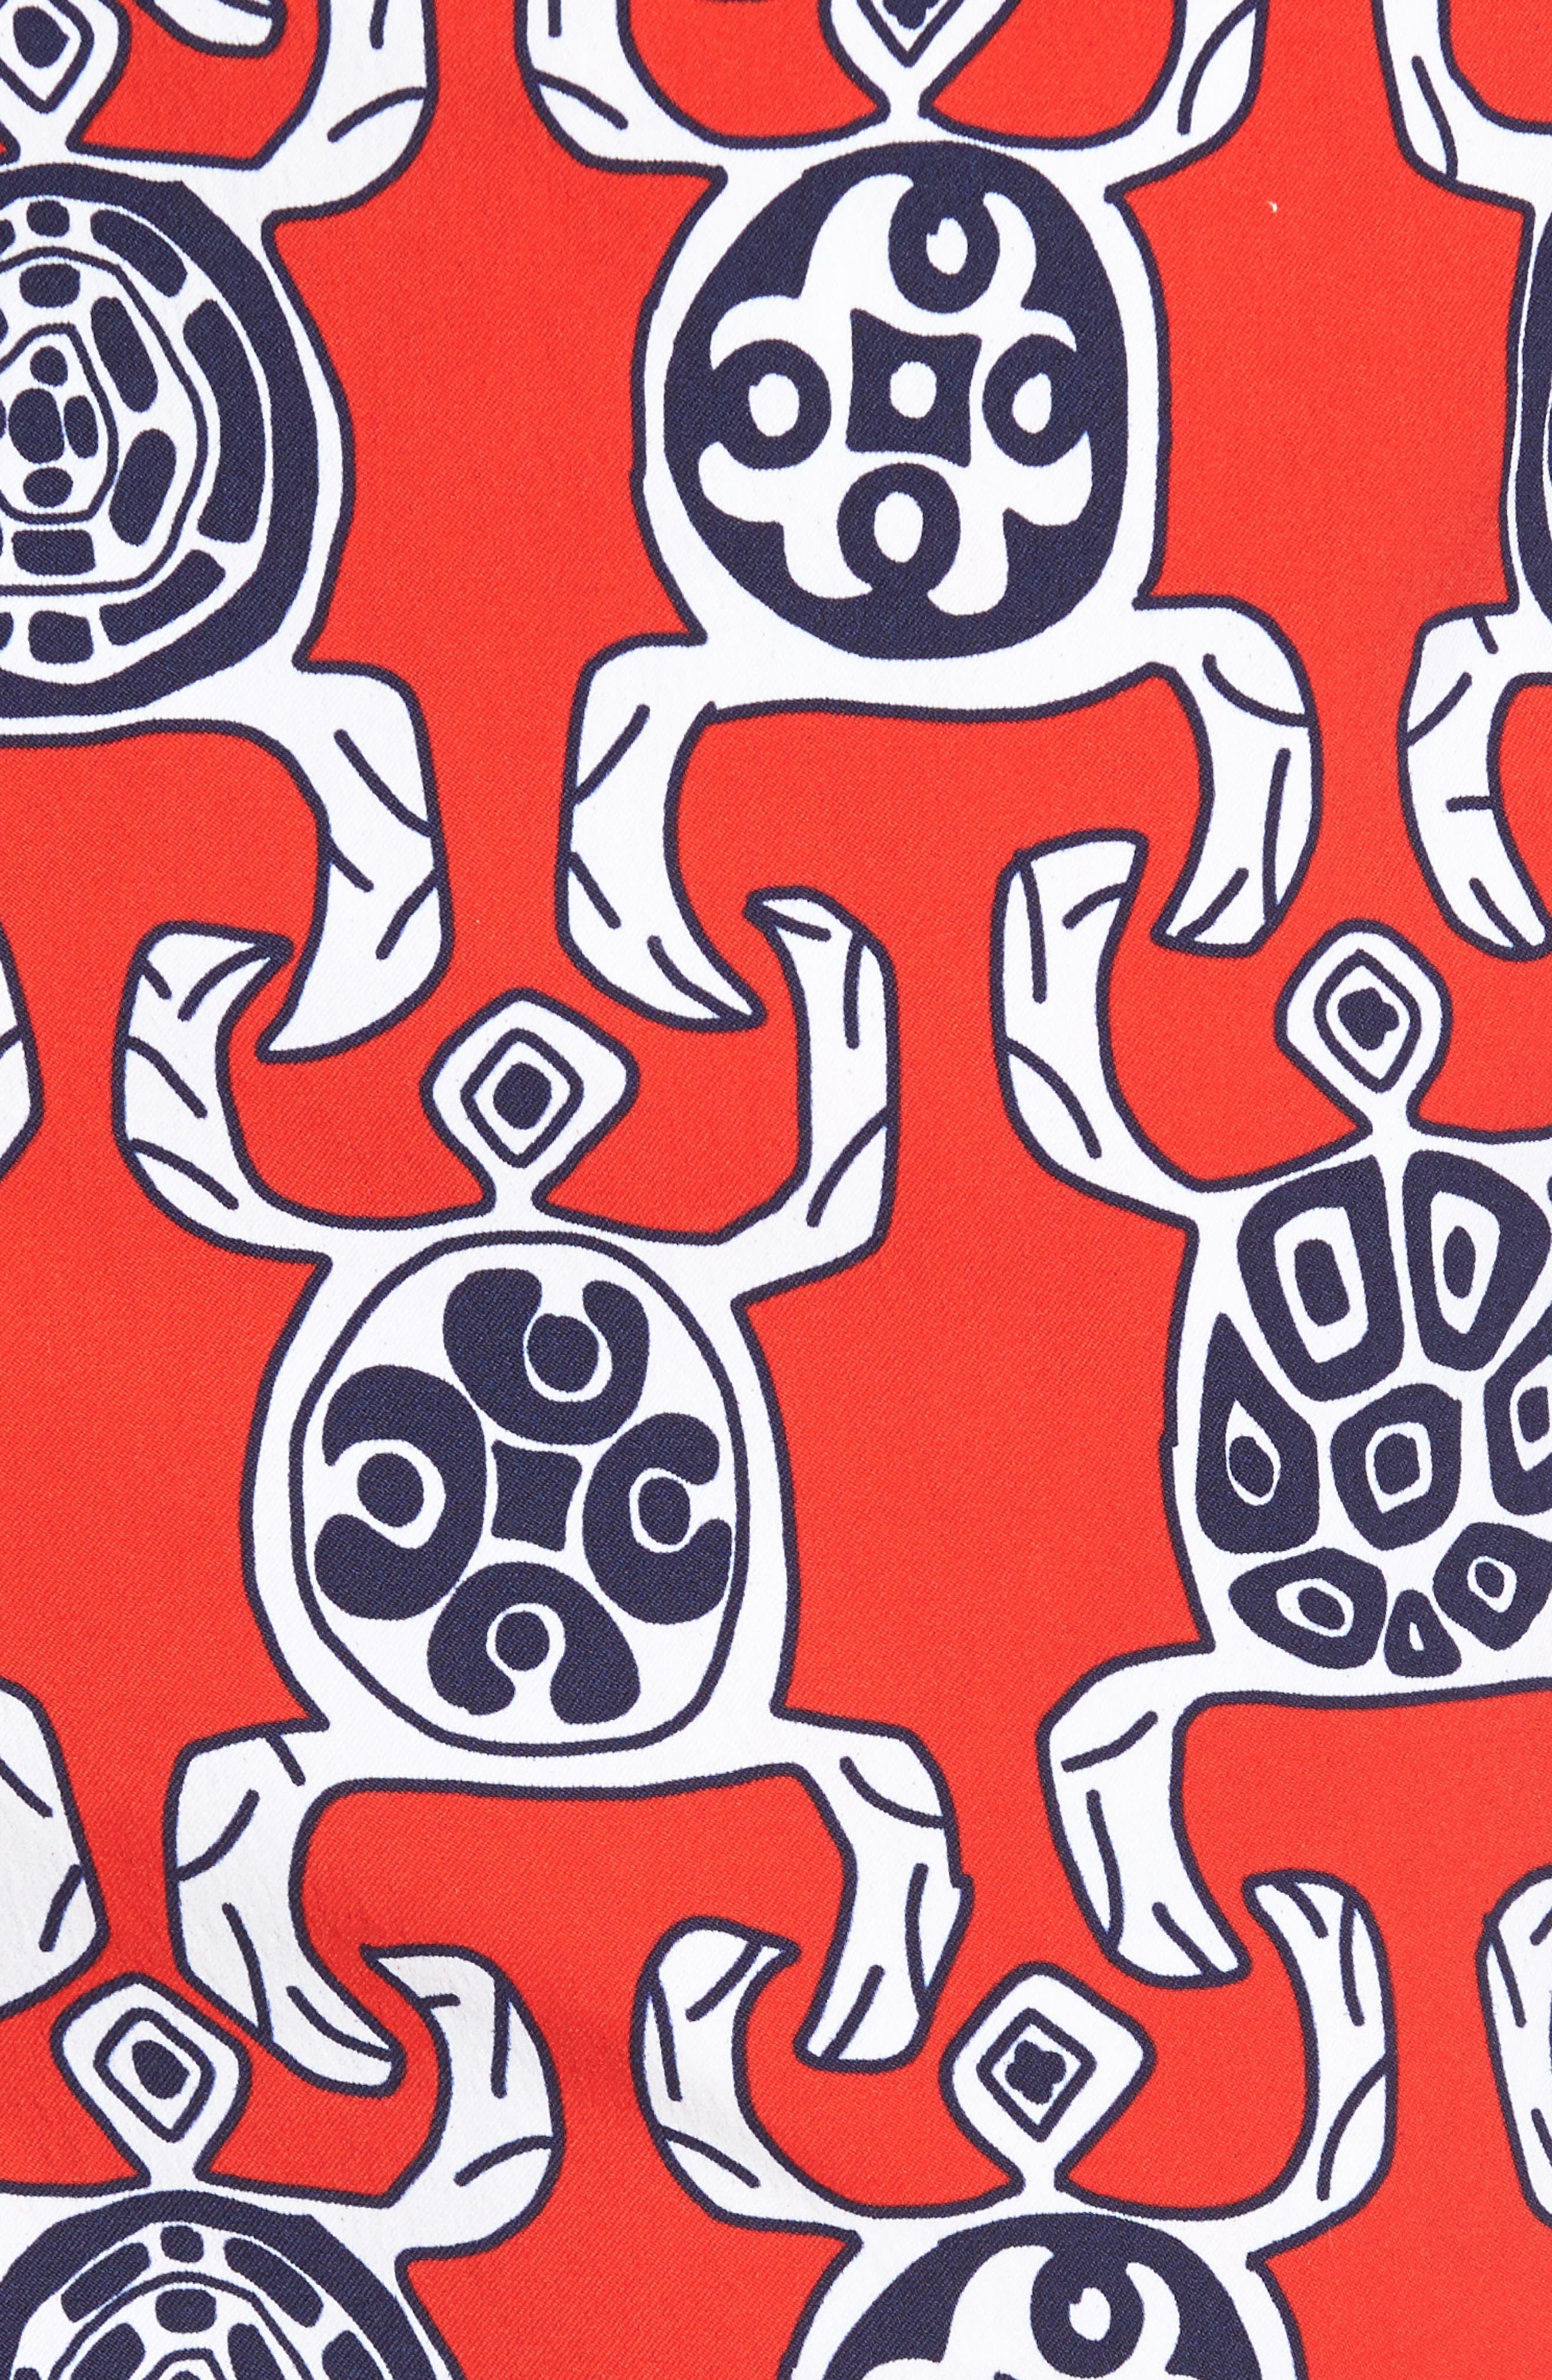 Primitive Turtles Swim Trunks,                             Alternate thumbnail 5, color,                             POPPY RED